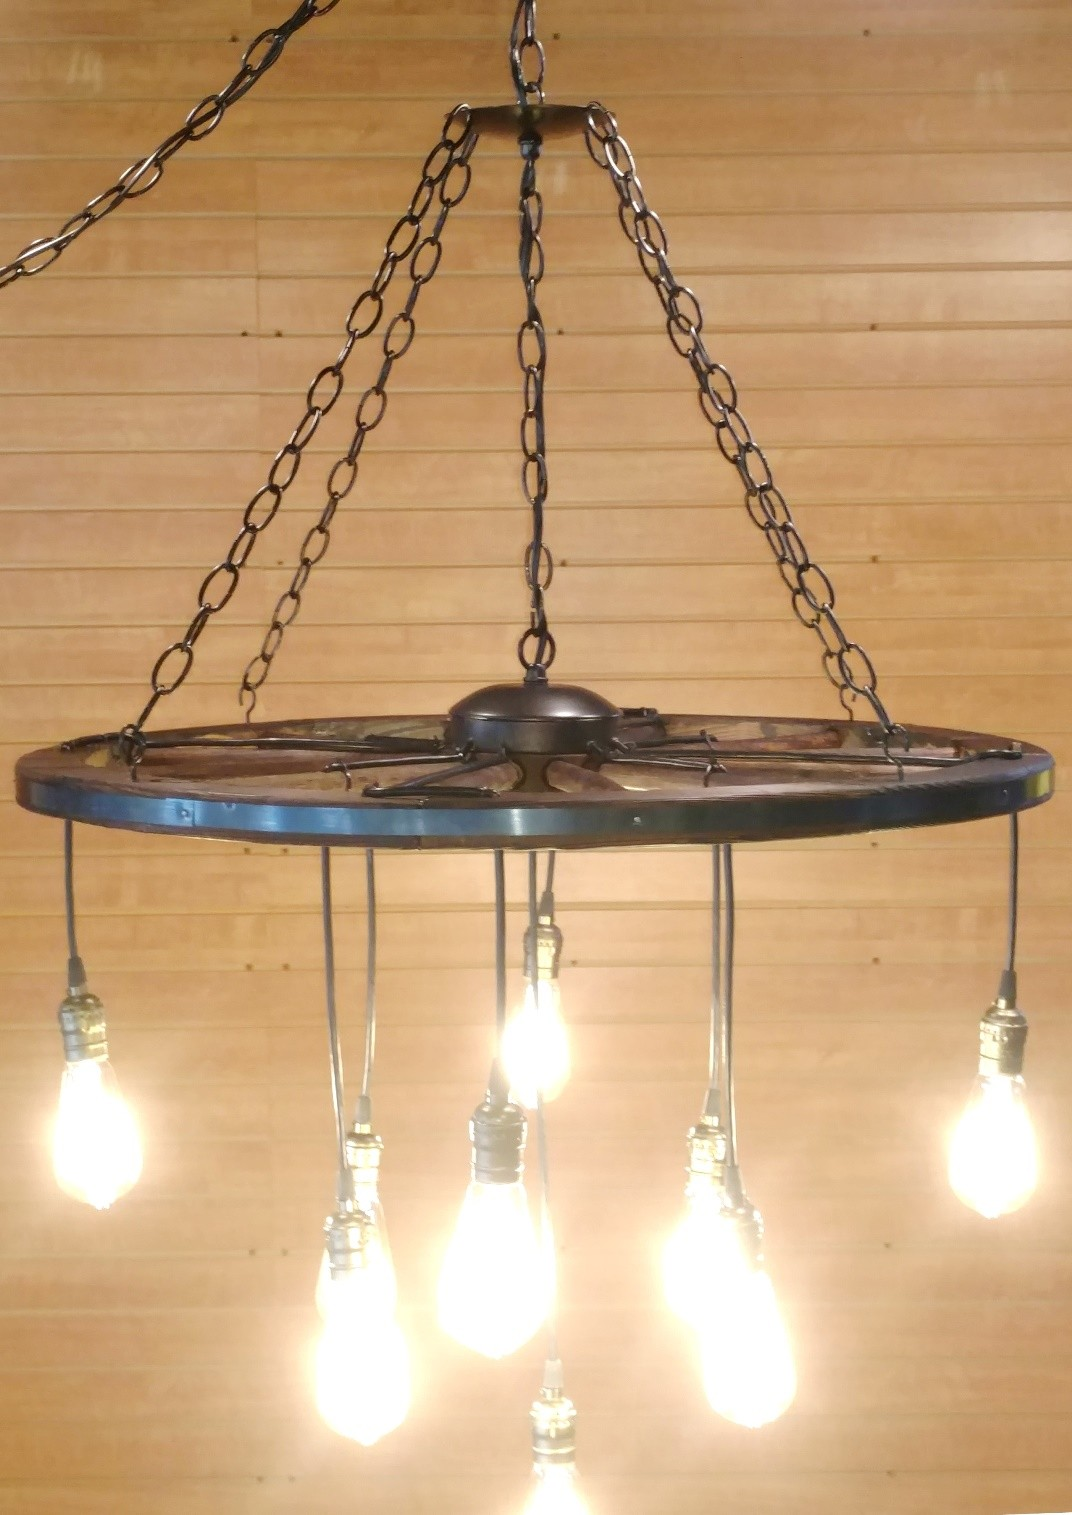 Wagon Wheel Chandelier Swag Lamp Lamp Shade Pro